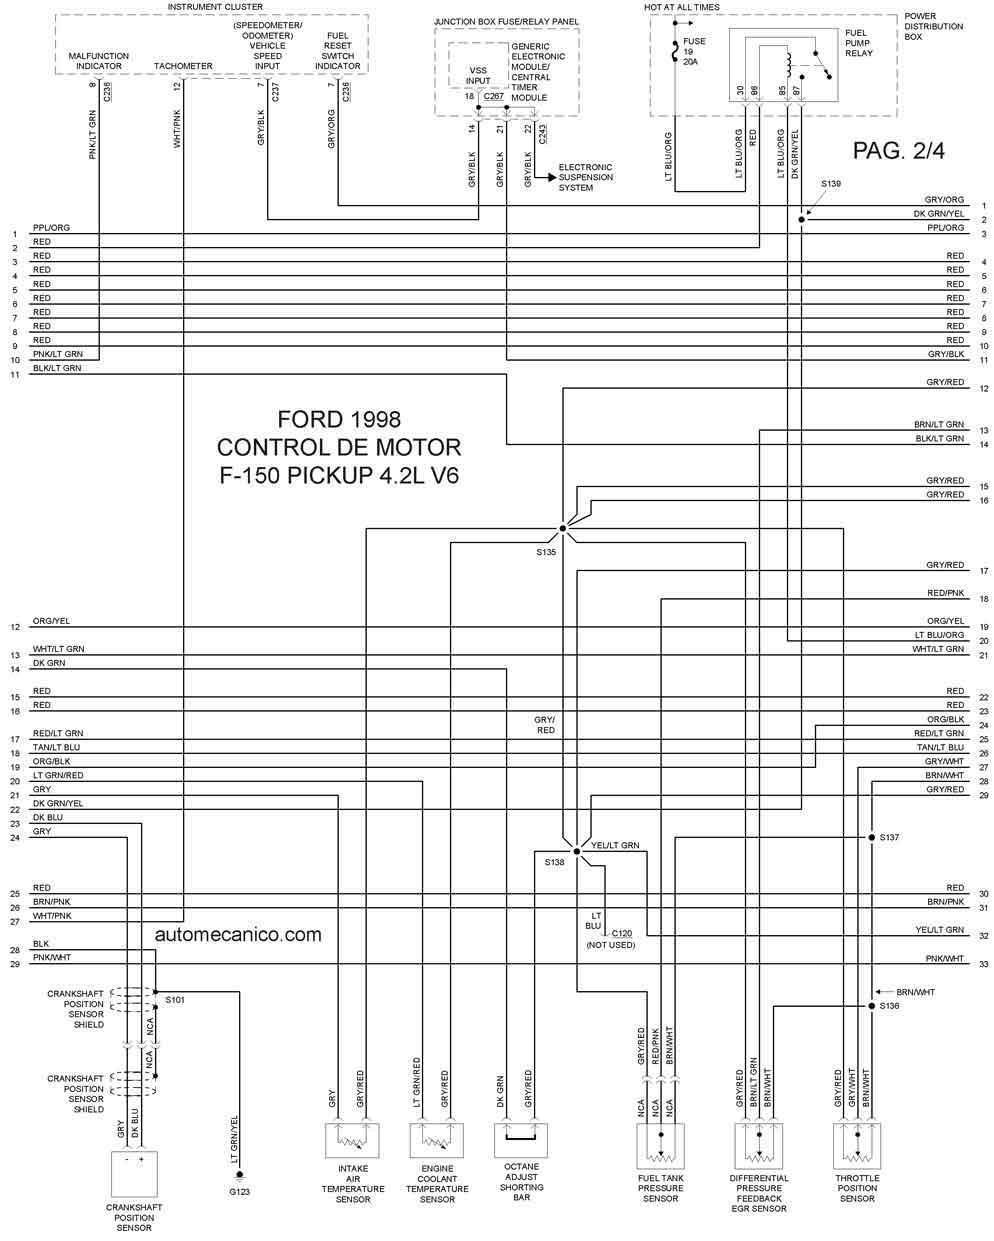 Ford 1998DiagramasEsquemasGraphicsvehiculosmotoresmecanica